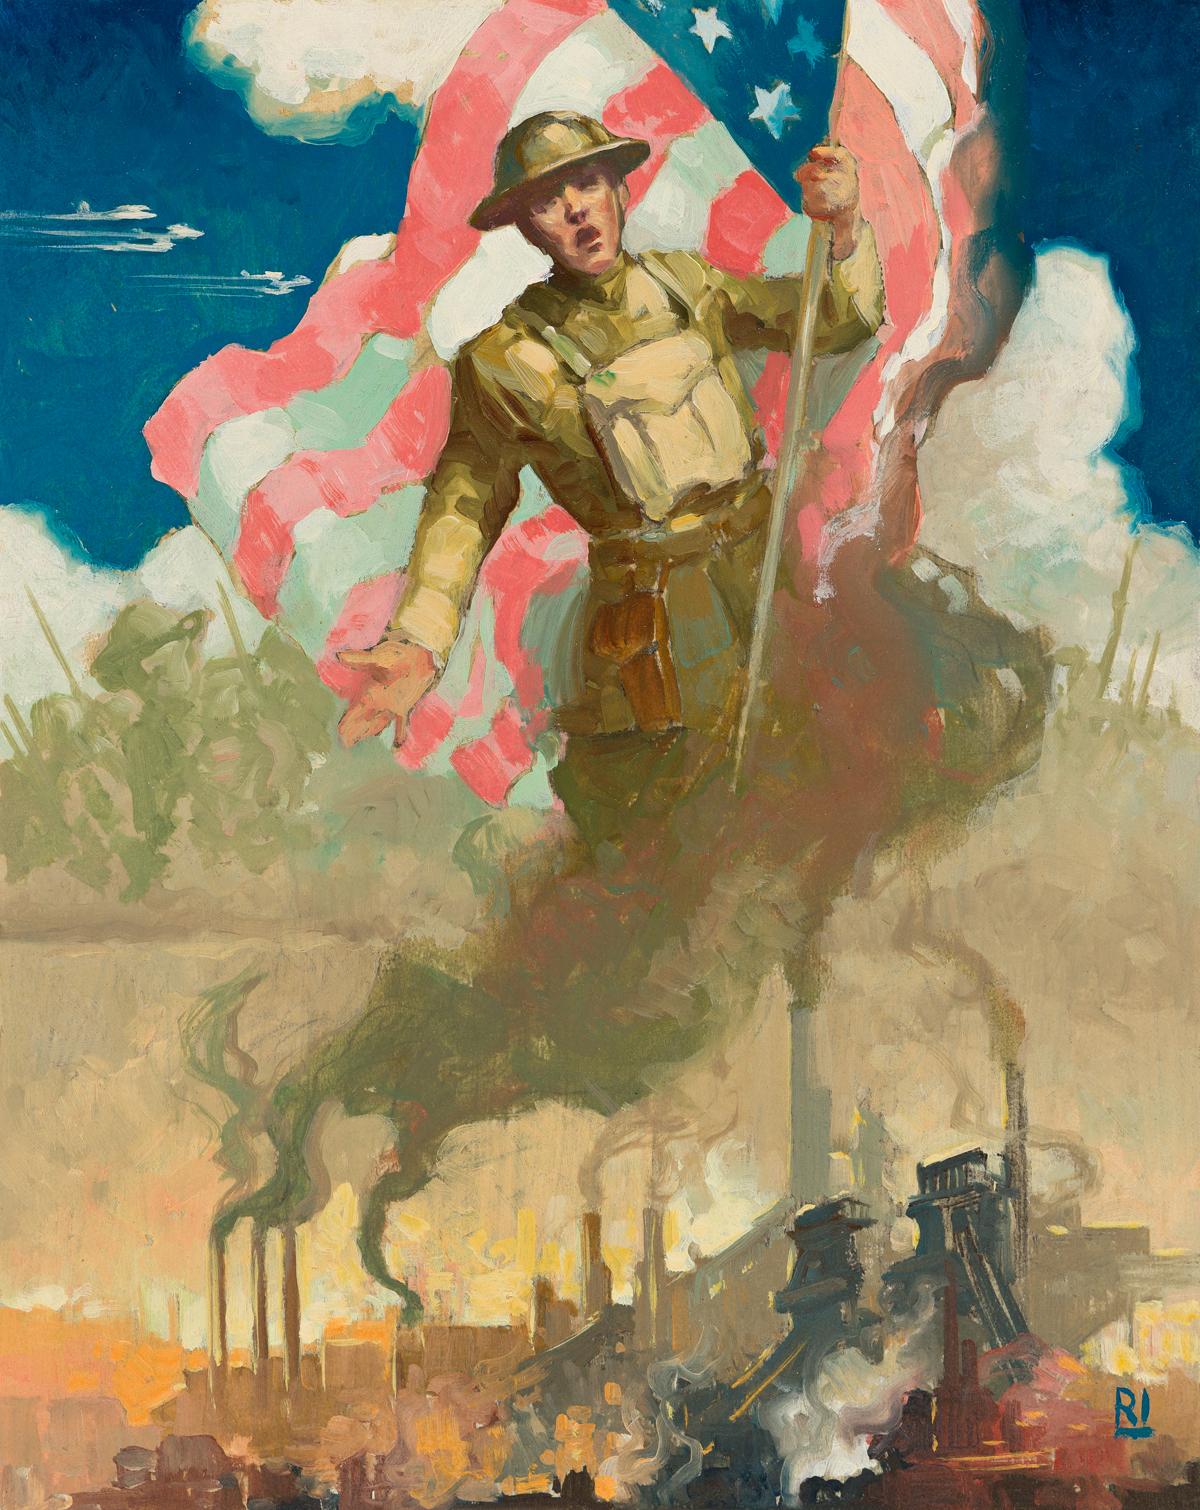 RALPH ILIGAN (1894-1960) Study for World War II Propaganda Poster.